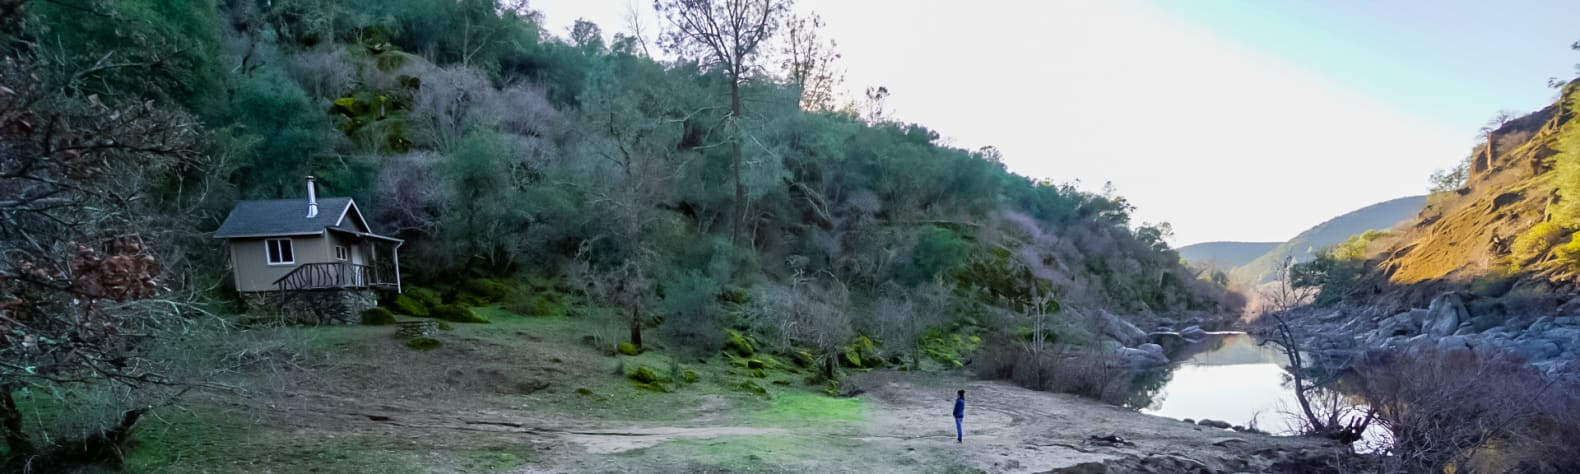 Cosumnes River Ranch